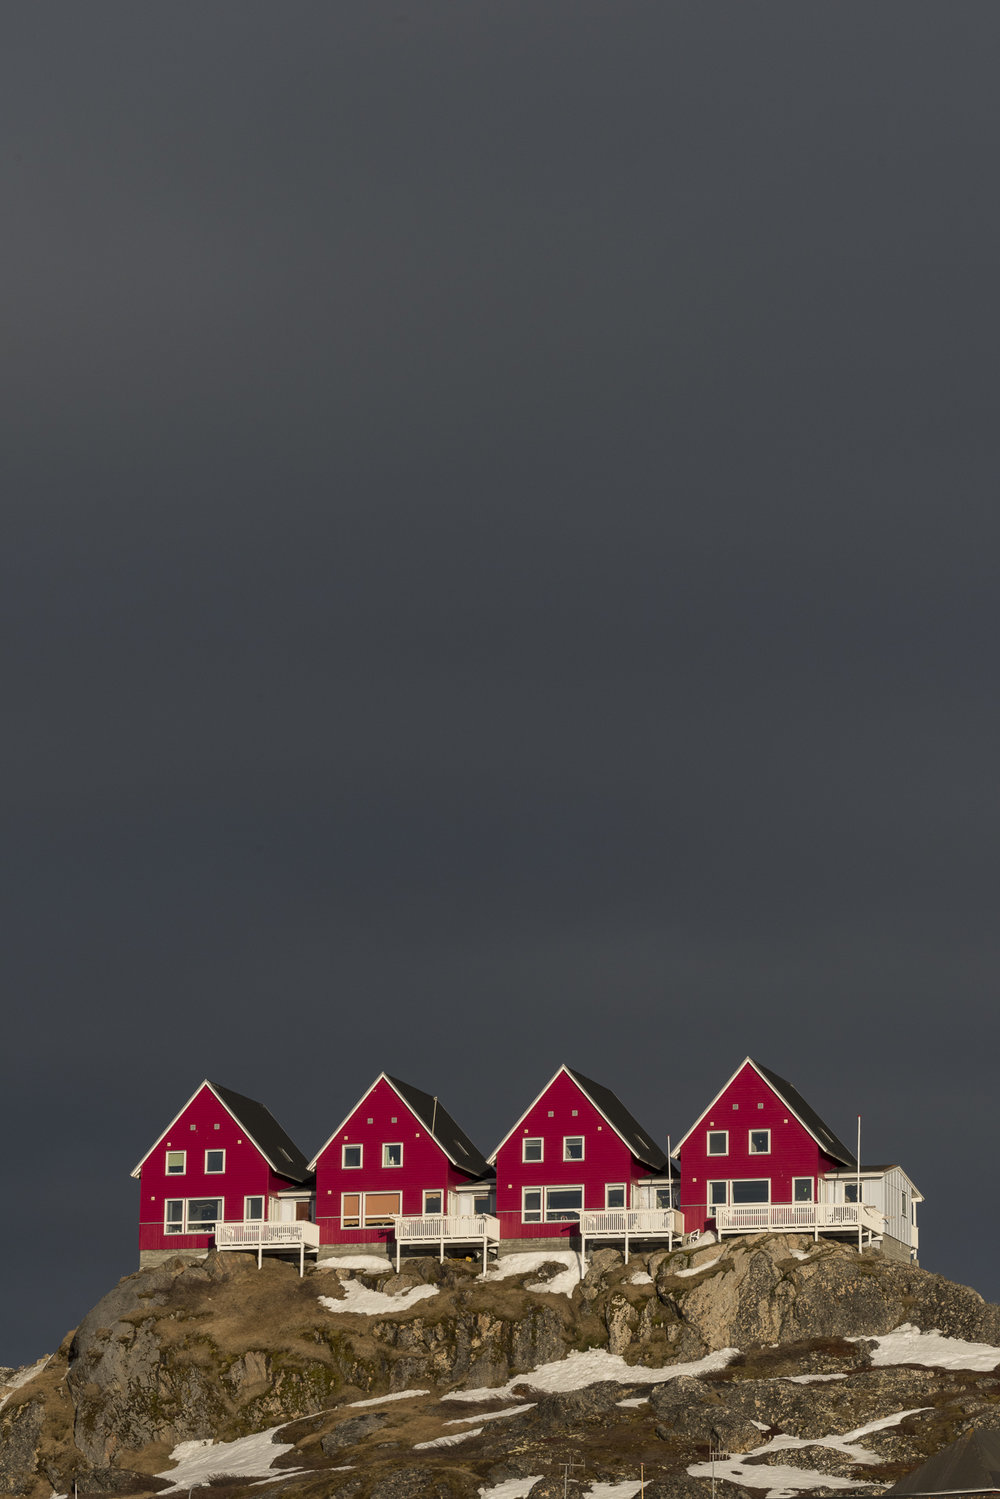 4.Defibaugh_Greenland_Sisimiut_36.jpg